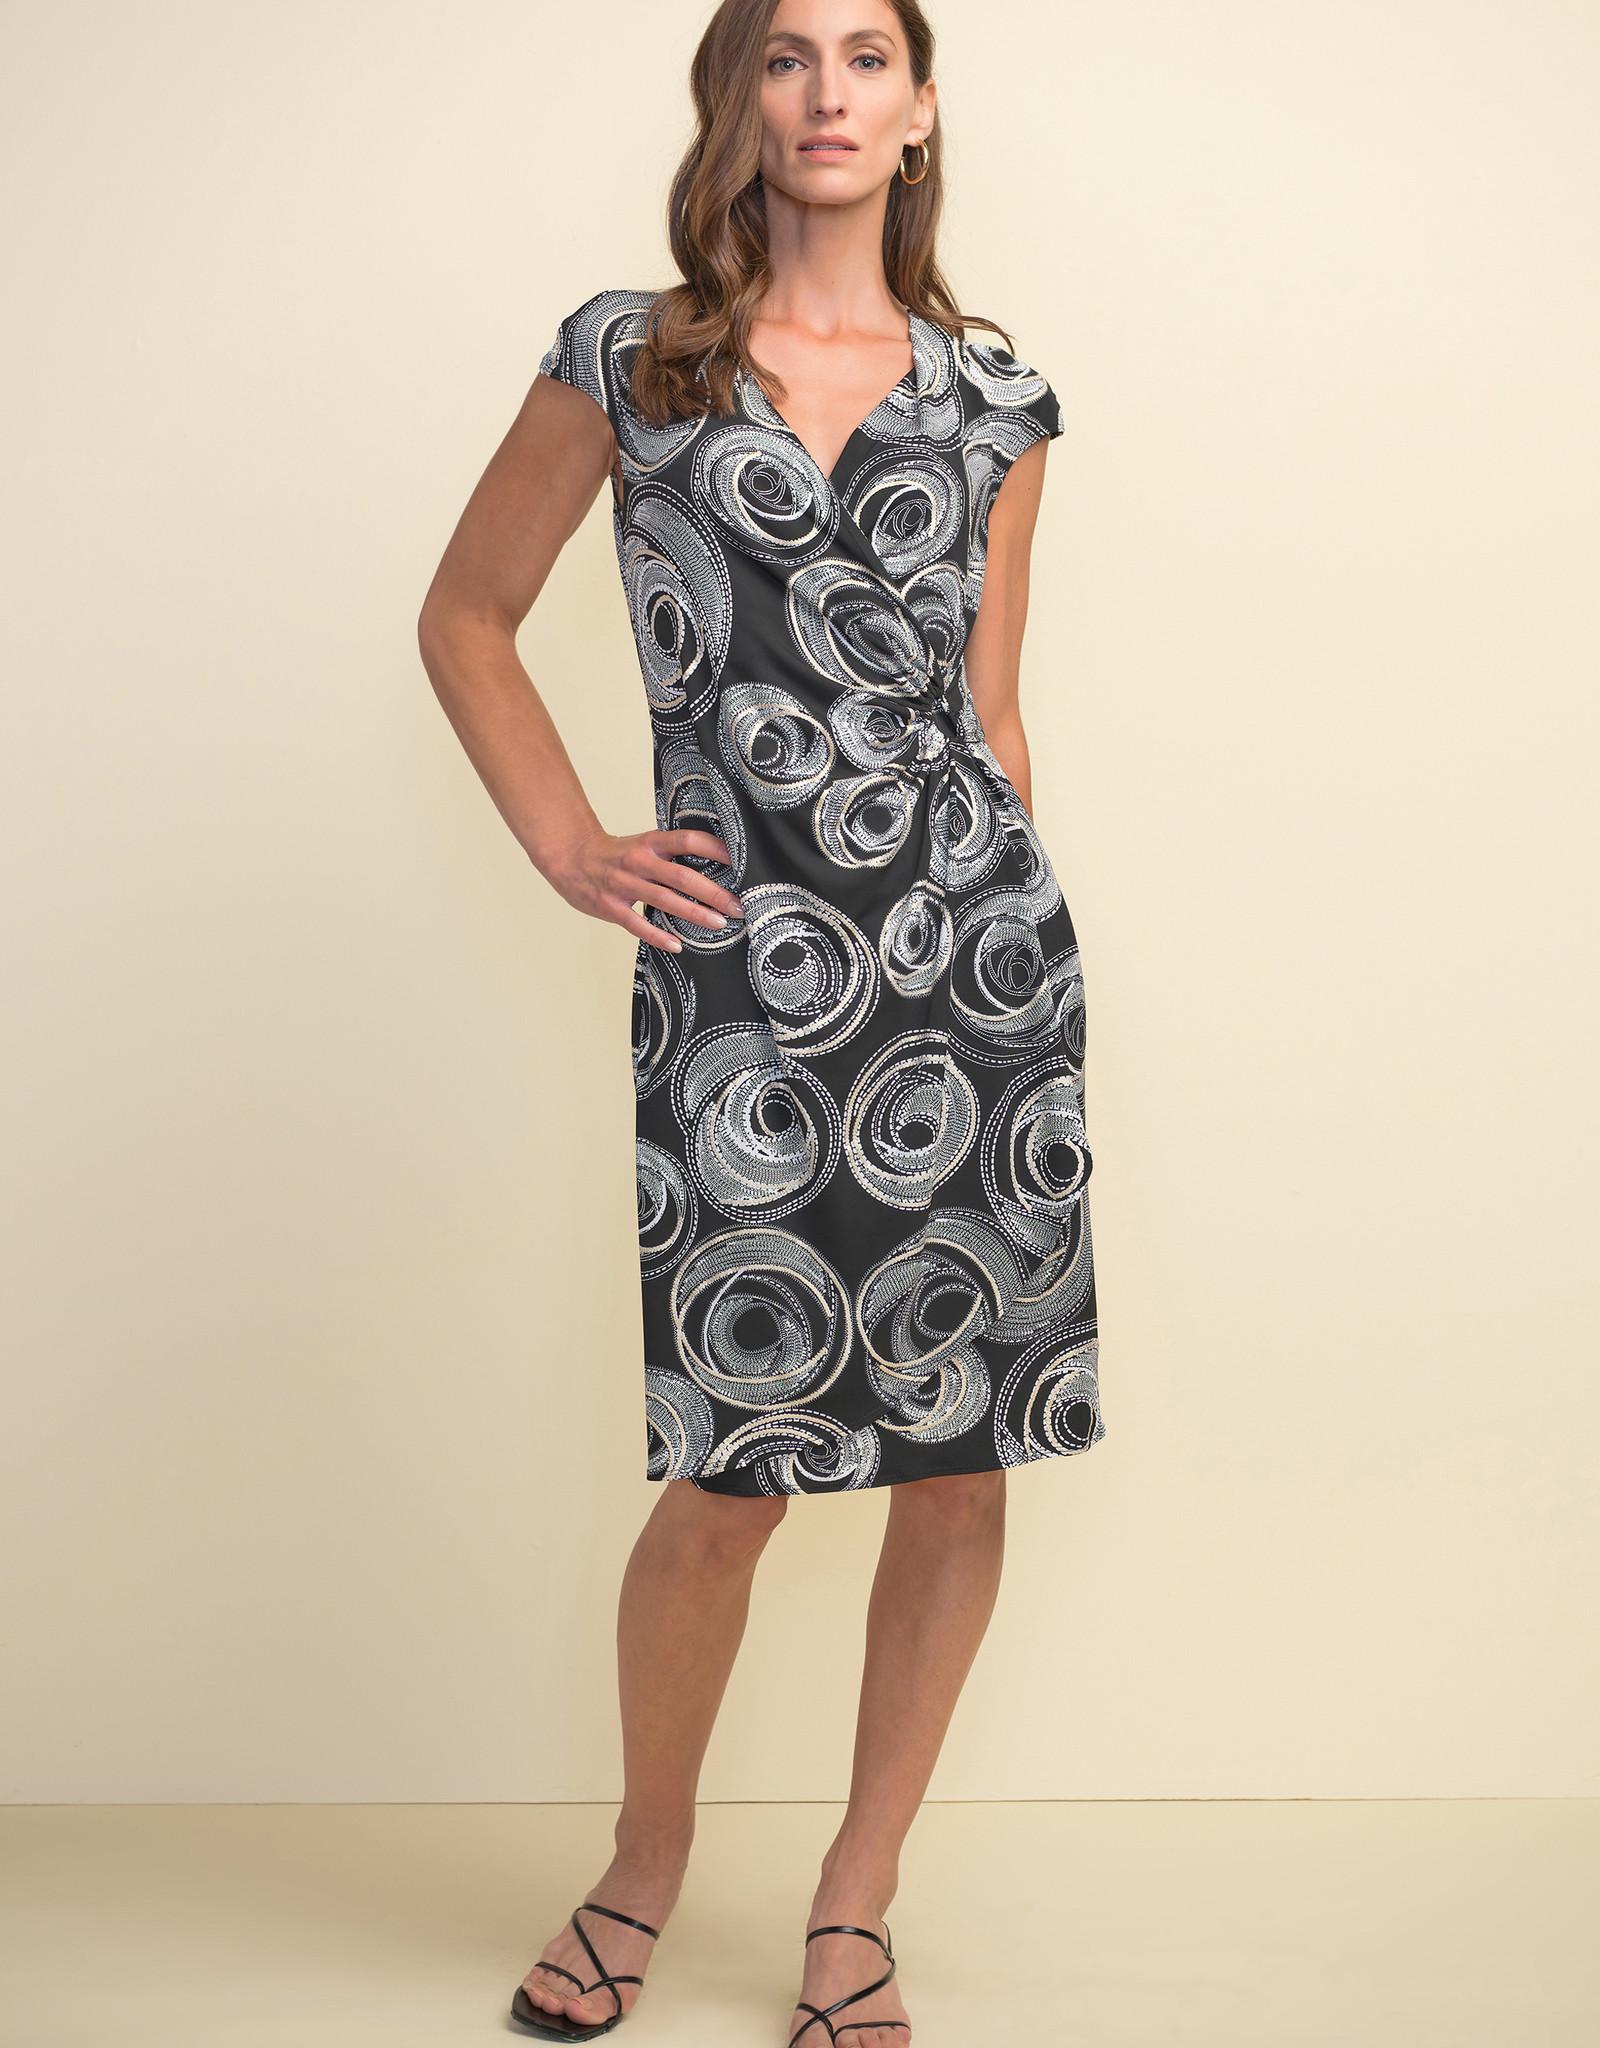 Joseph Ribkoff Joseph Ribkoff 211245 Faux Wrap Dress with Cap Sleeves